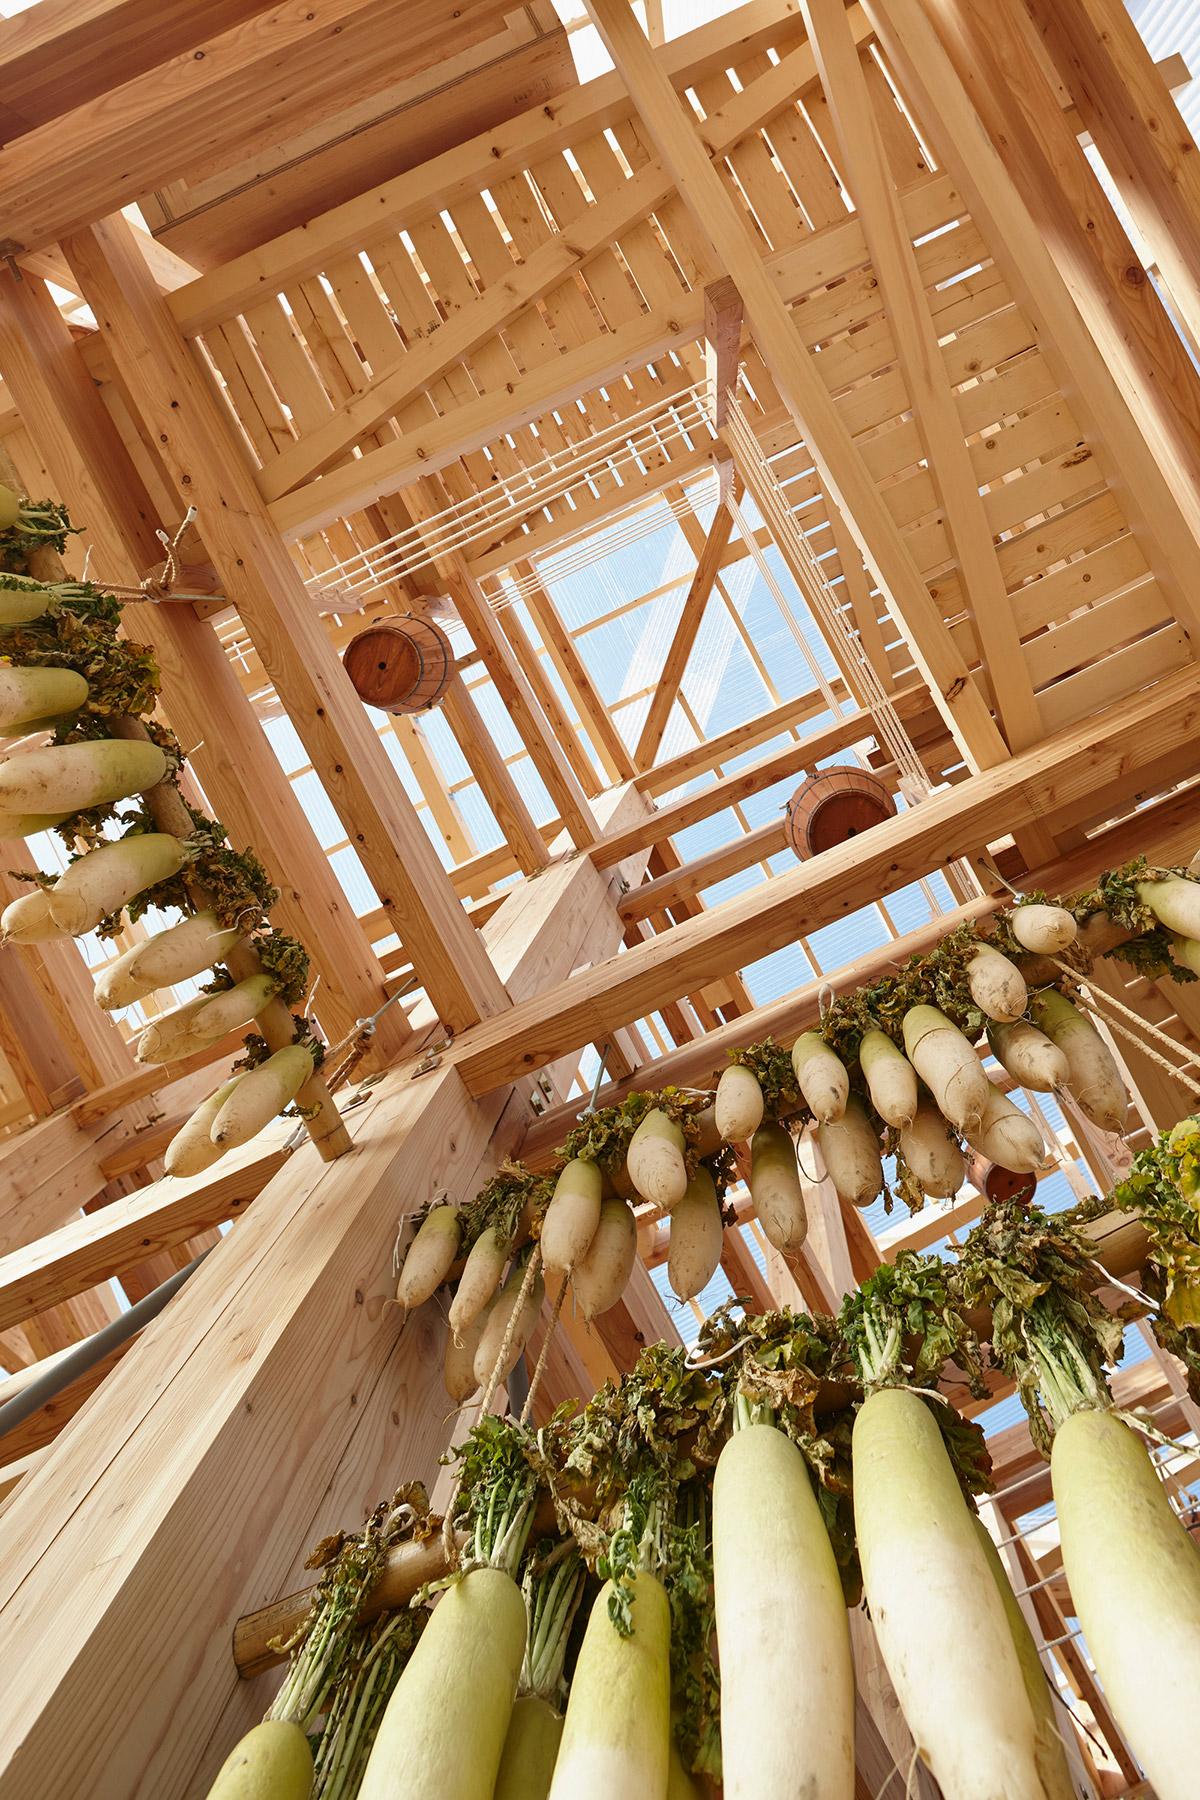 Nest We Grow / College of Environmental Design & Kengo Kuma & Associates (33)